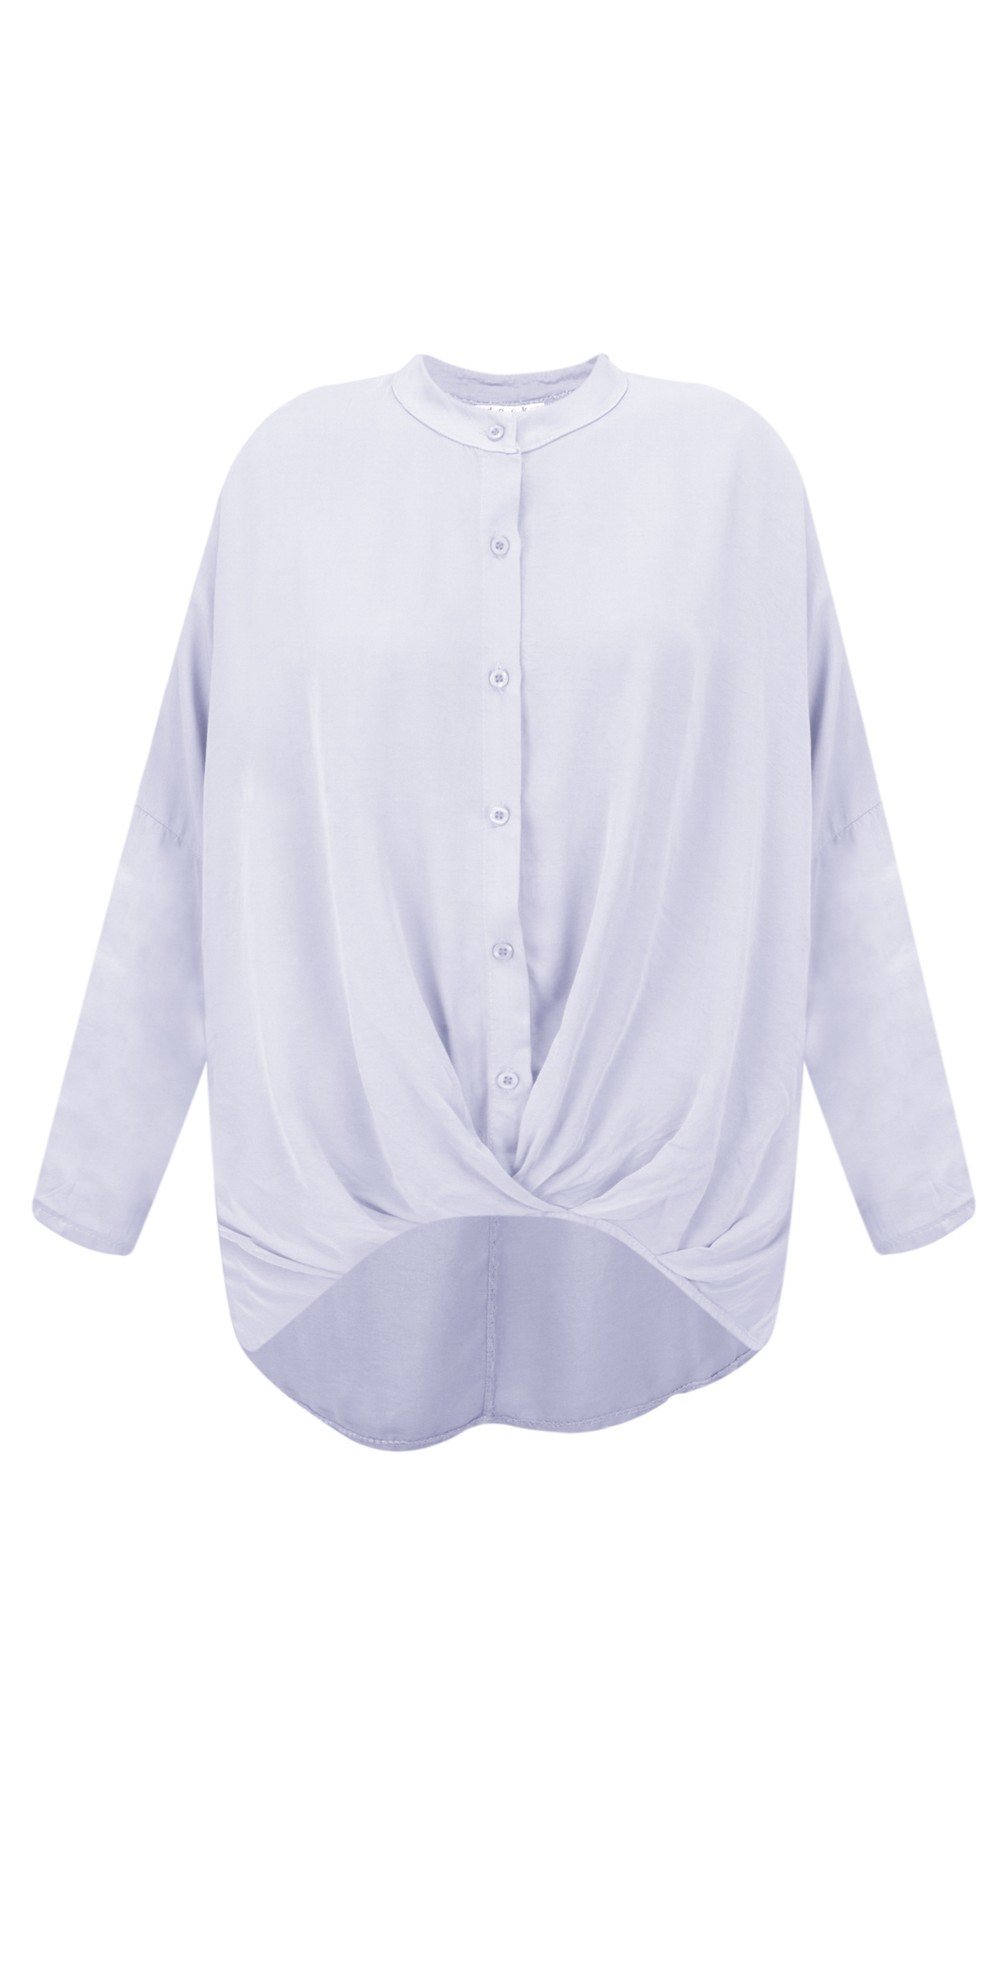 Evie Easyfit Shirt Top main image